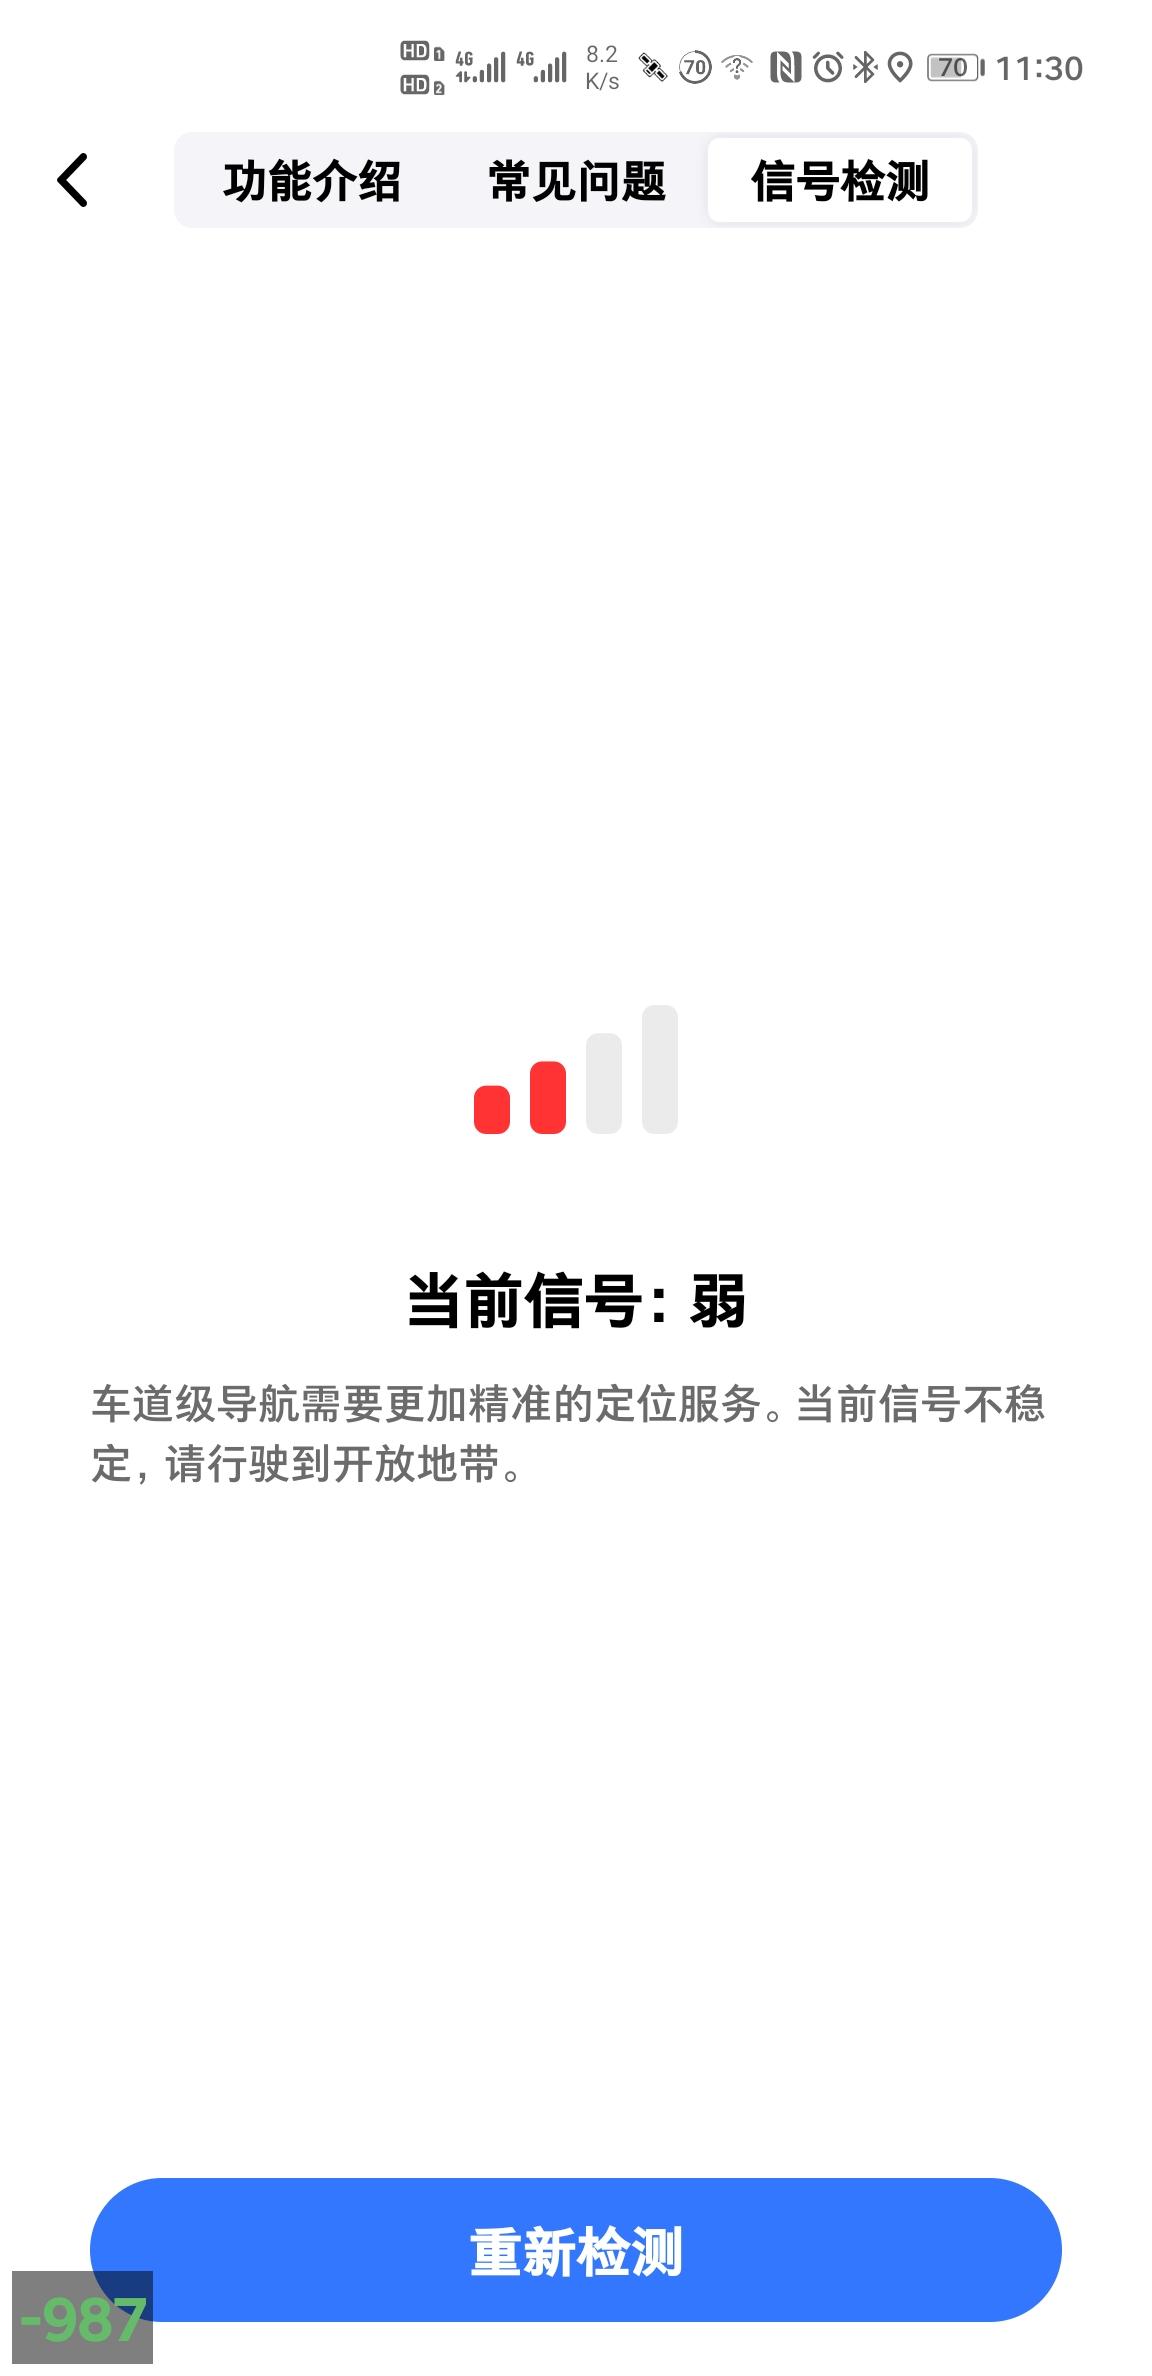 Screenshot_20201120_113012_com.autonavi.minimap.jpg